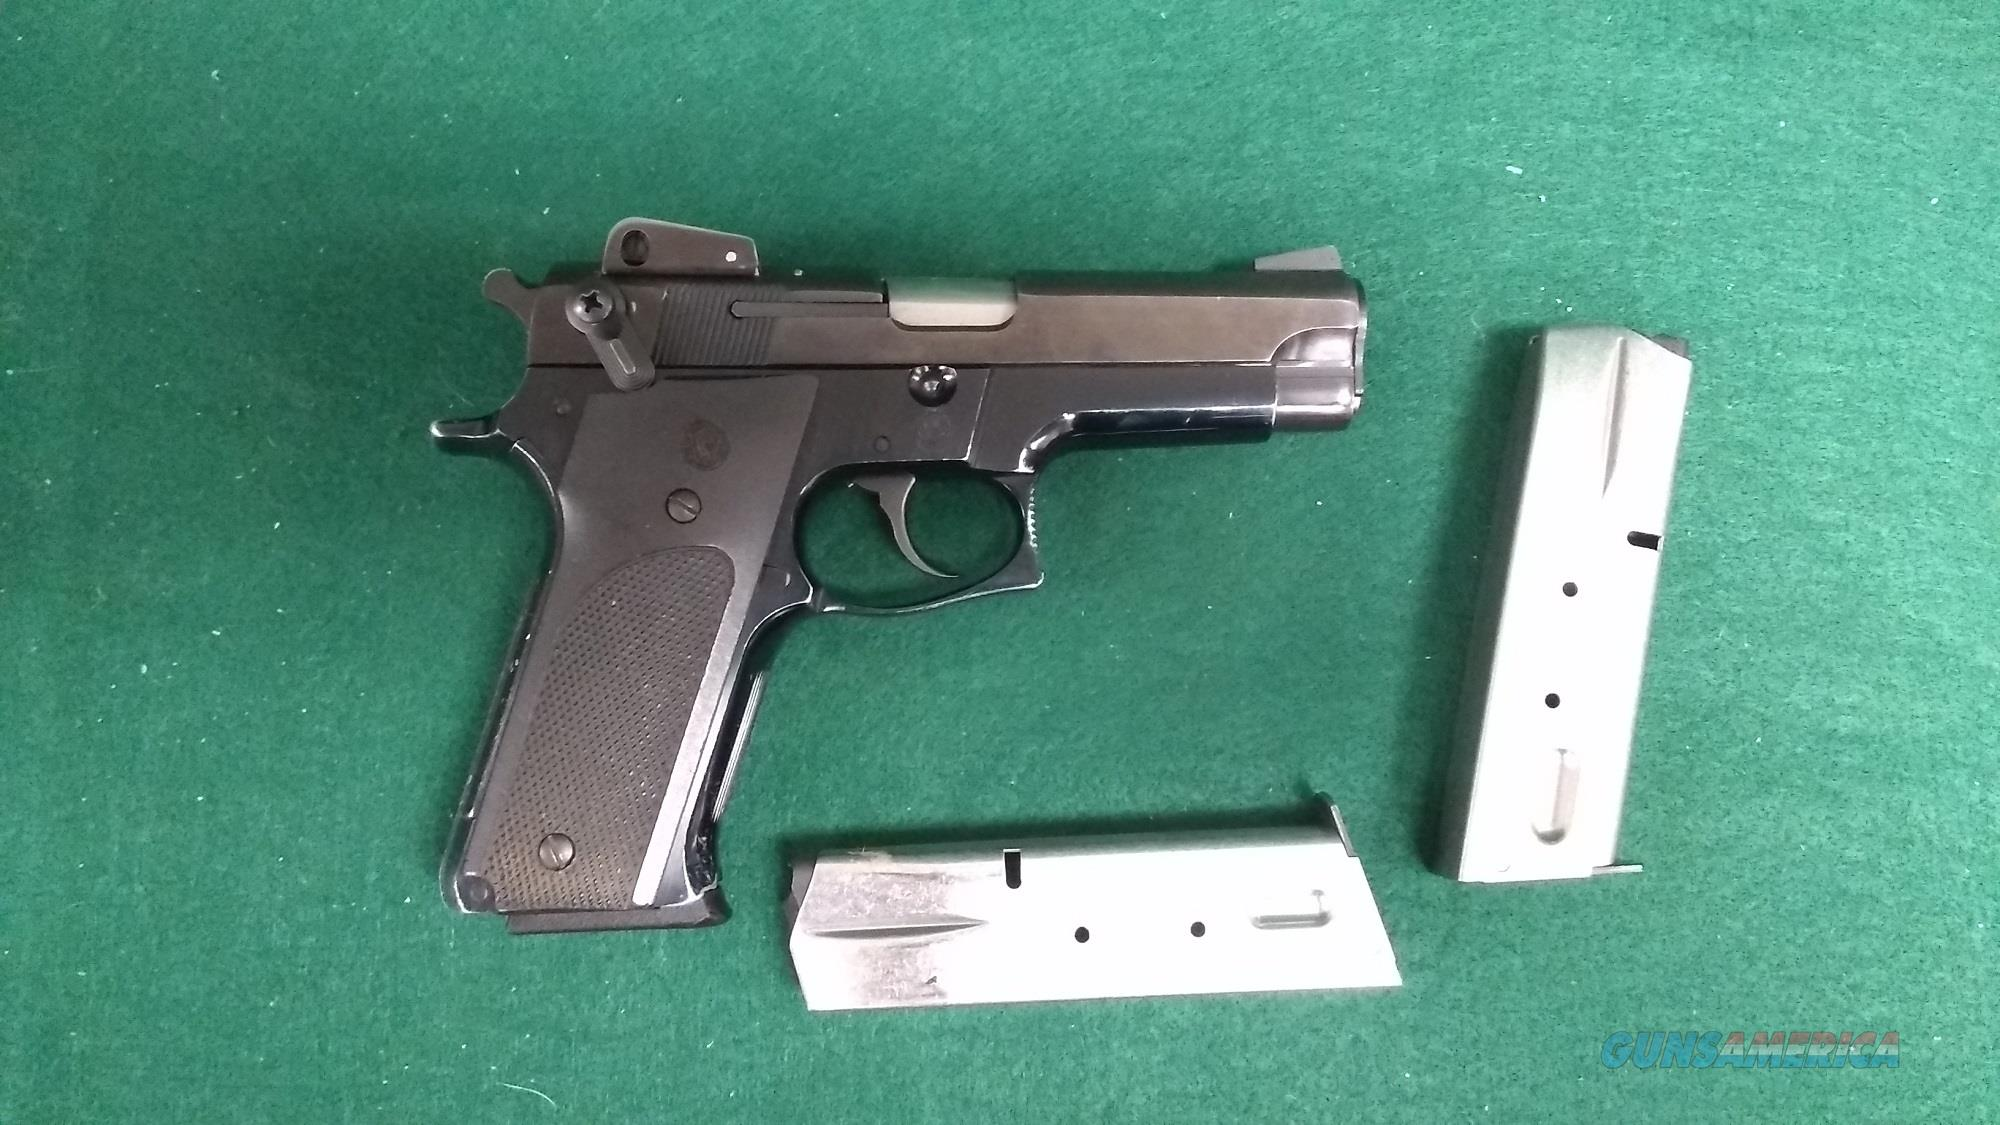 Smith & Wesson 459 9mm - Three magazines  Guns > Pistols > Smith & Wesson Pistols - Autos > Alloy Frame